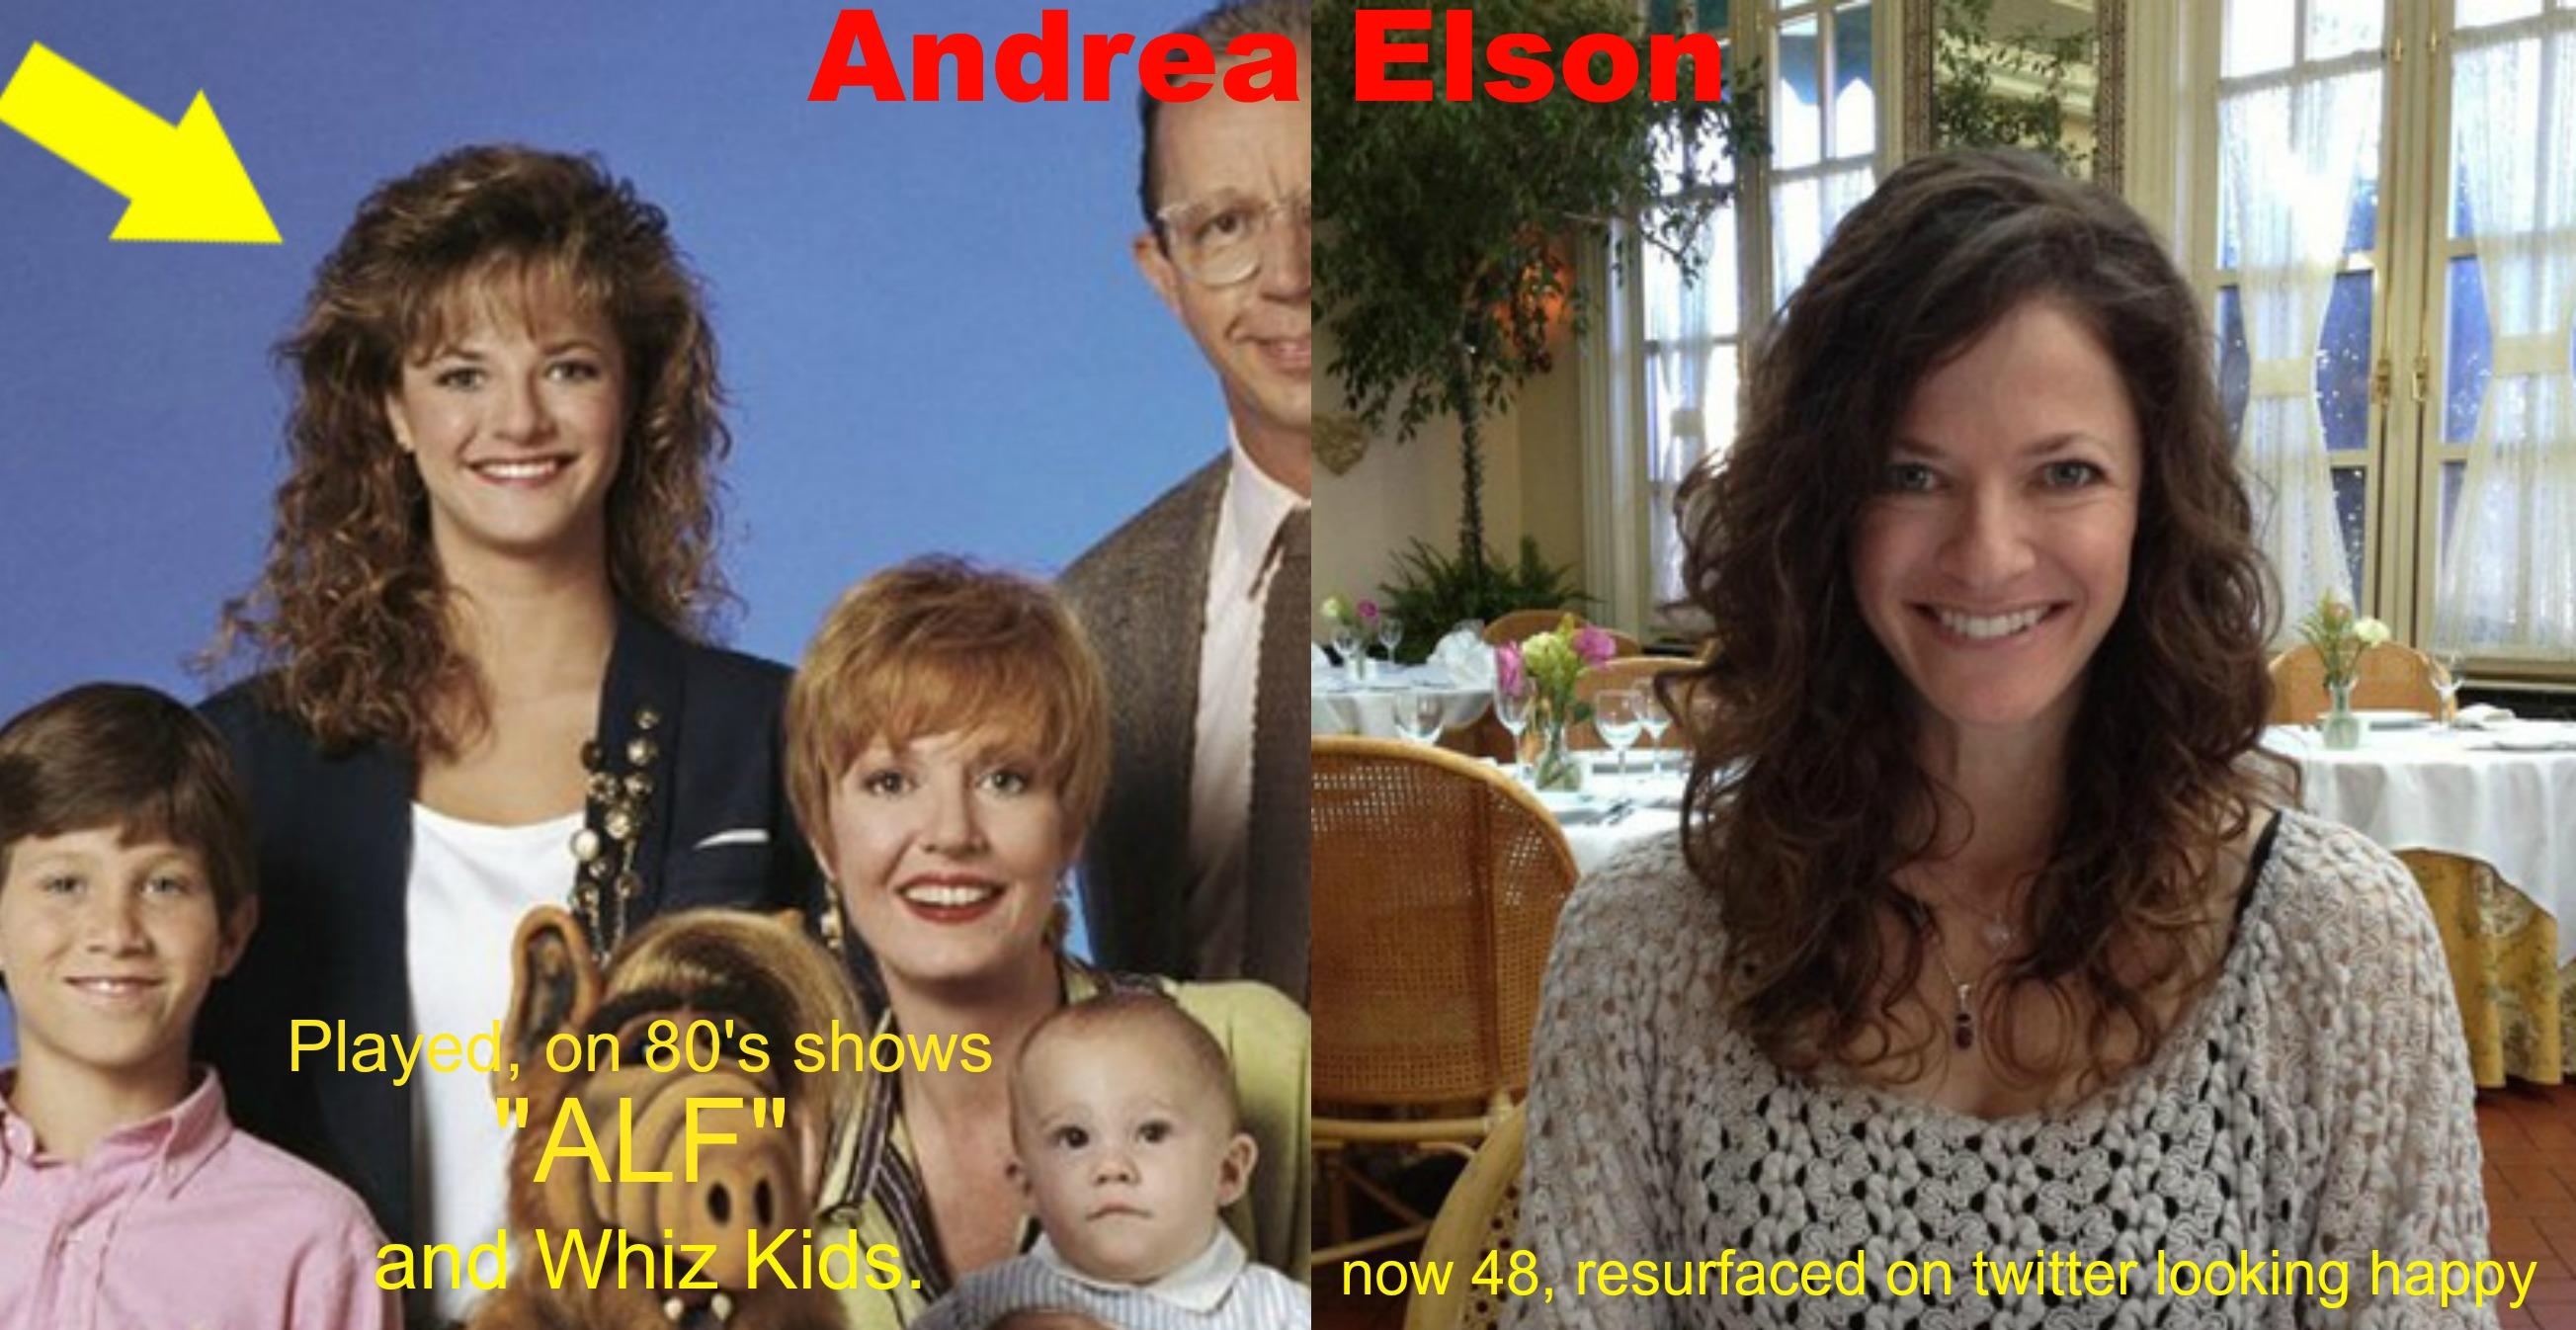 Andrea Elson Fotos andrea elson then and nowparislatts2001 on deviantart